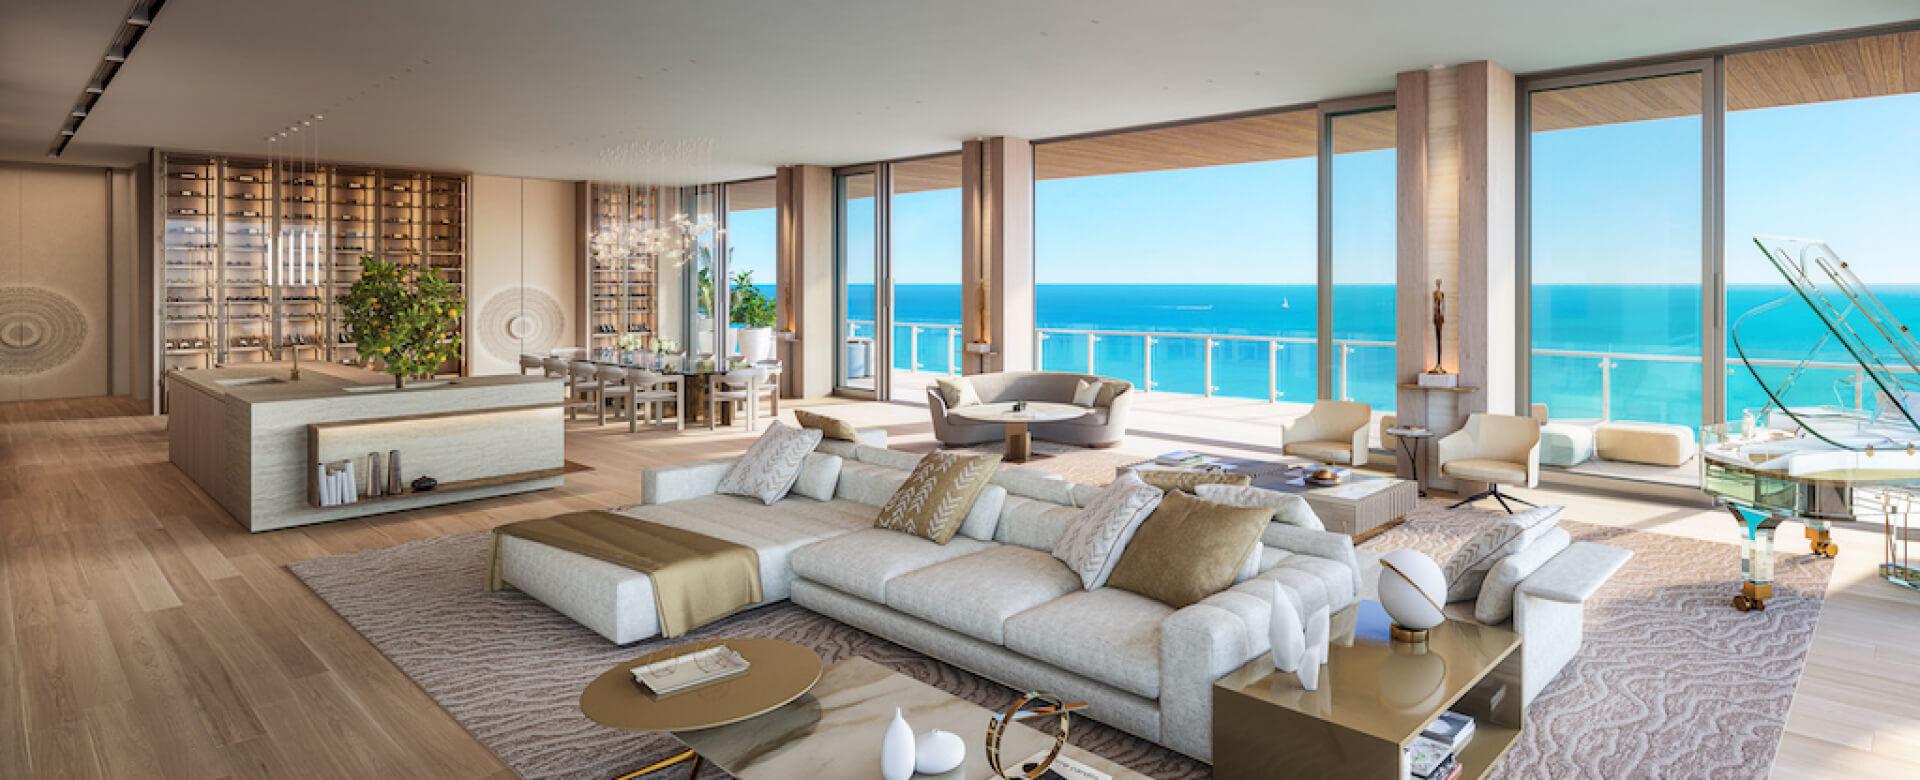 57 Ocean Miami Beach, foto 1